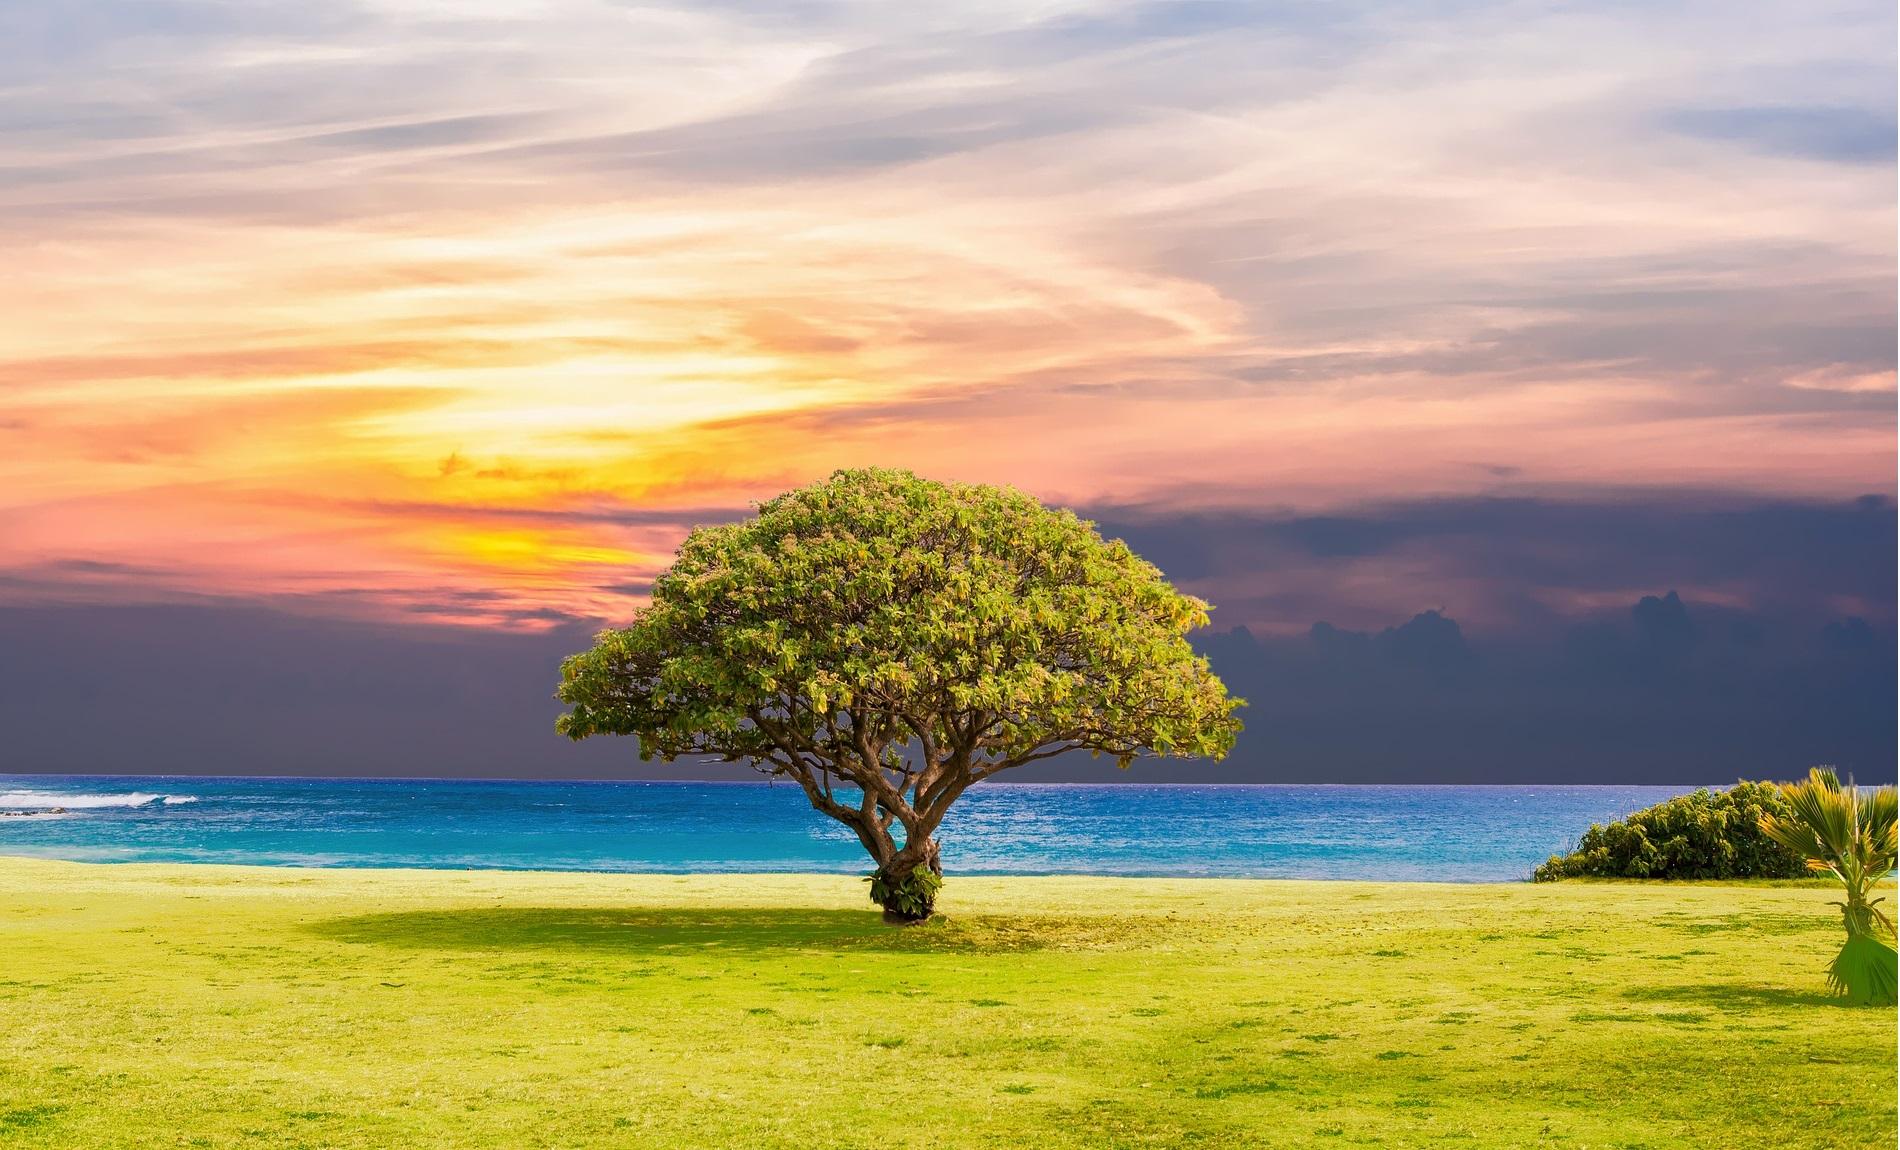 tree-2435269_1920